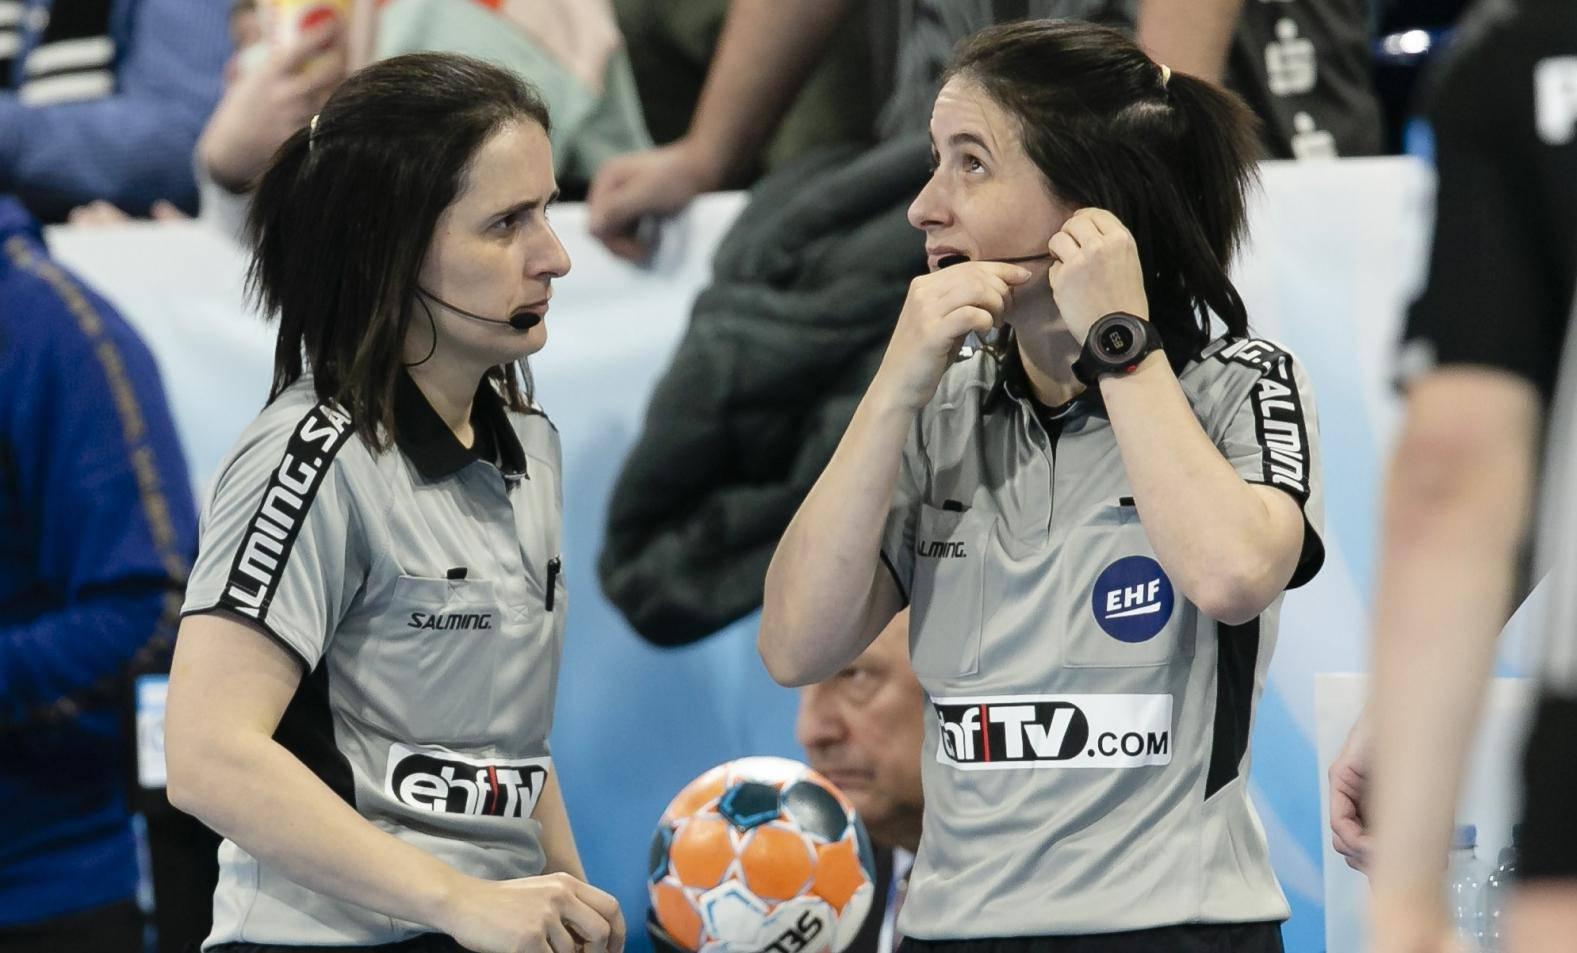 Handball EHF Cup: Foxes Berlin - FC Porto